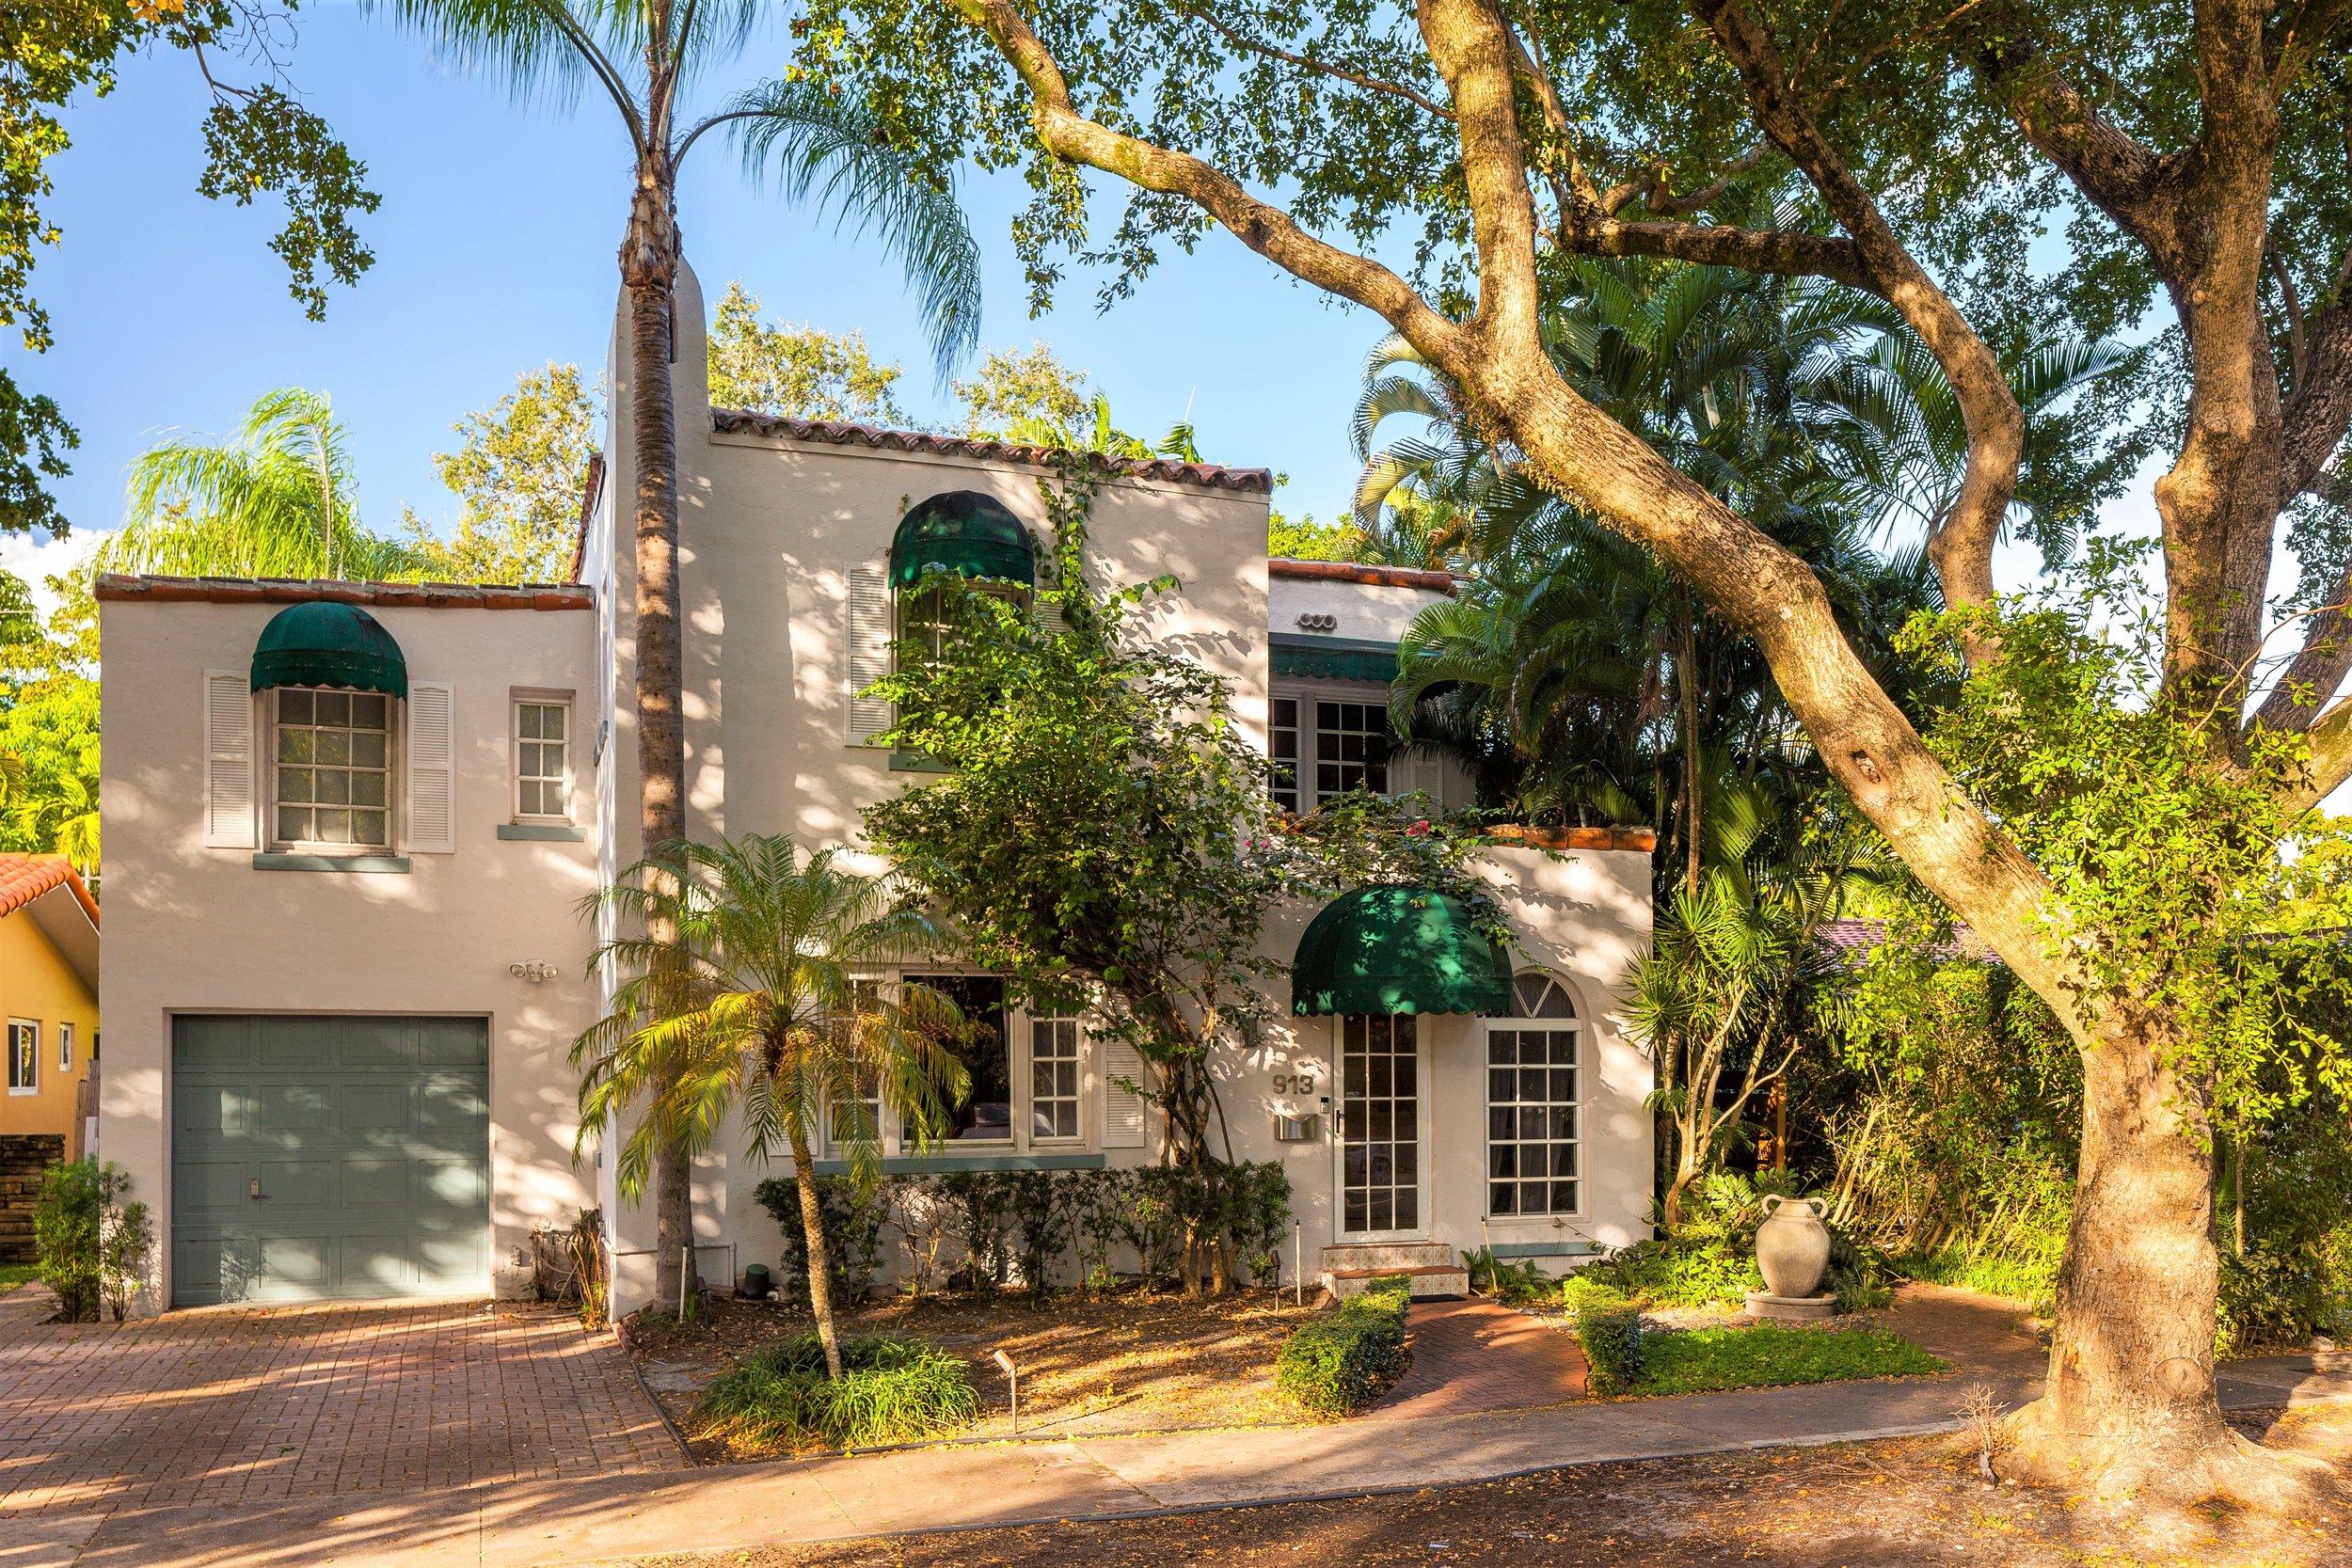 913 Medina Avenue   Sold for $660,000